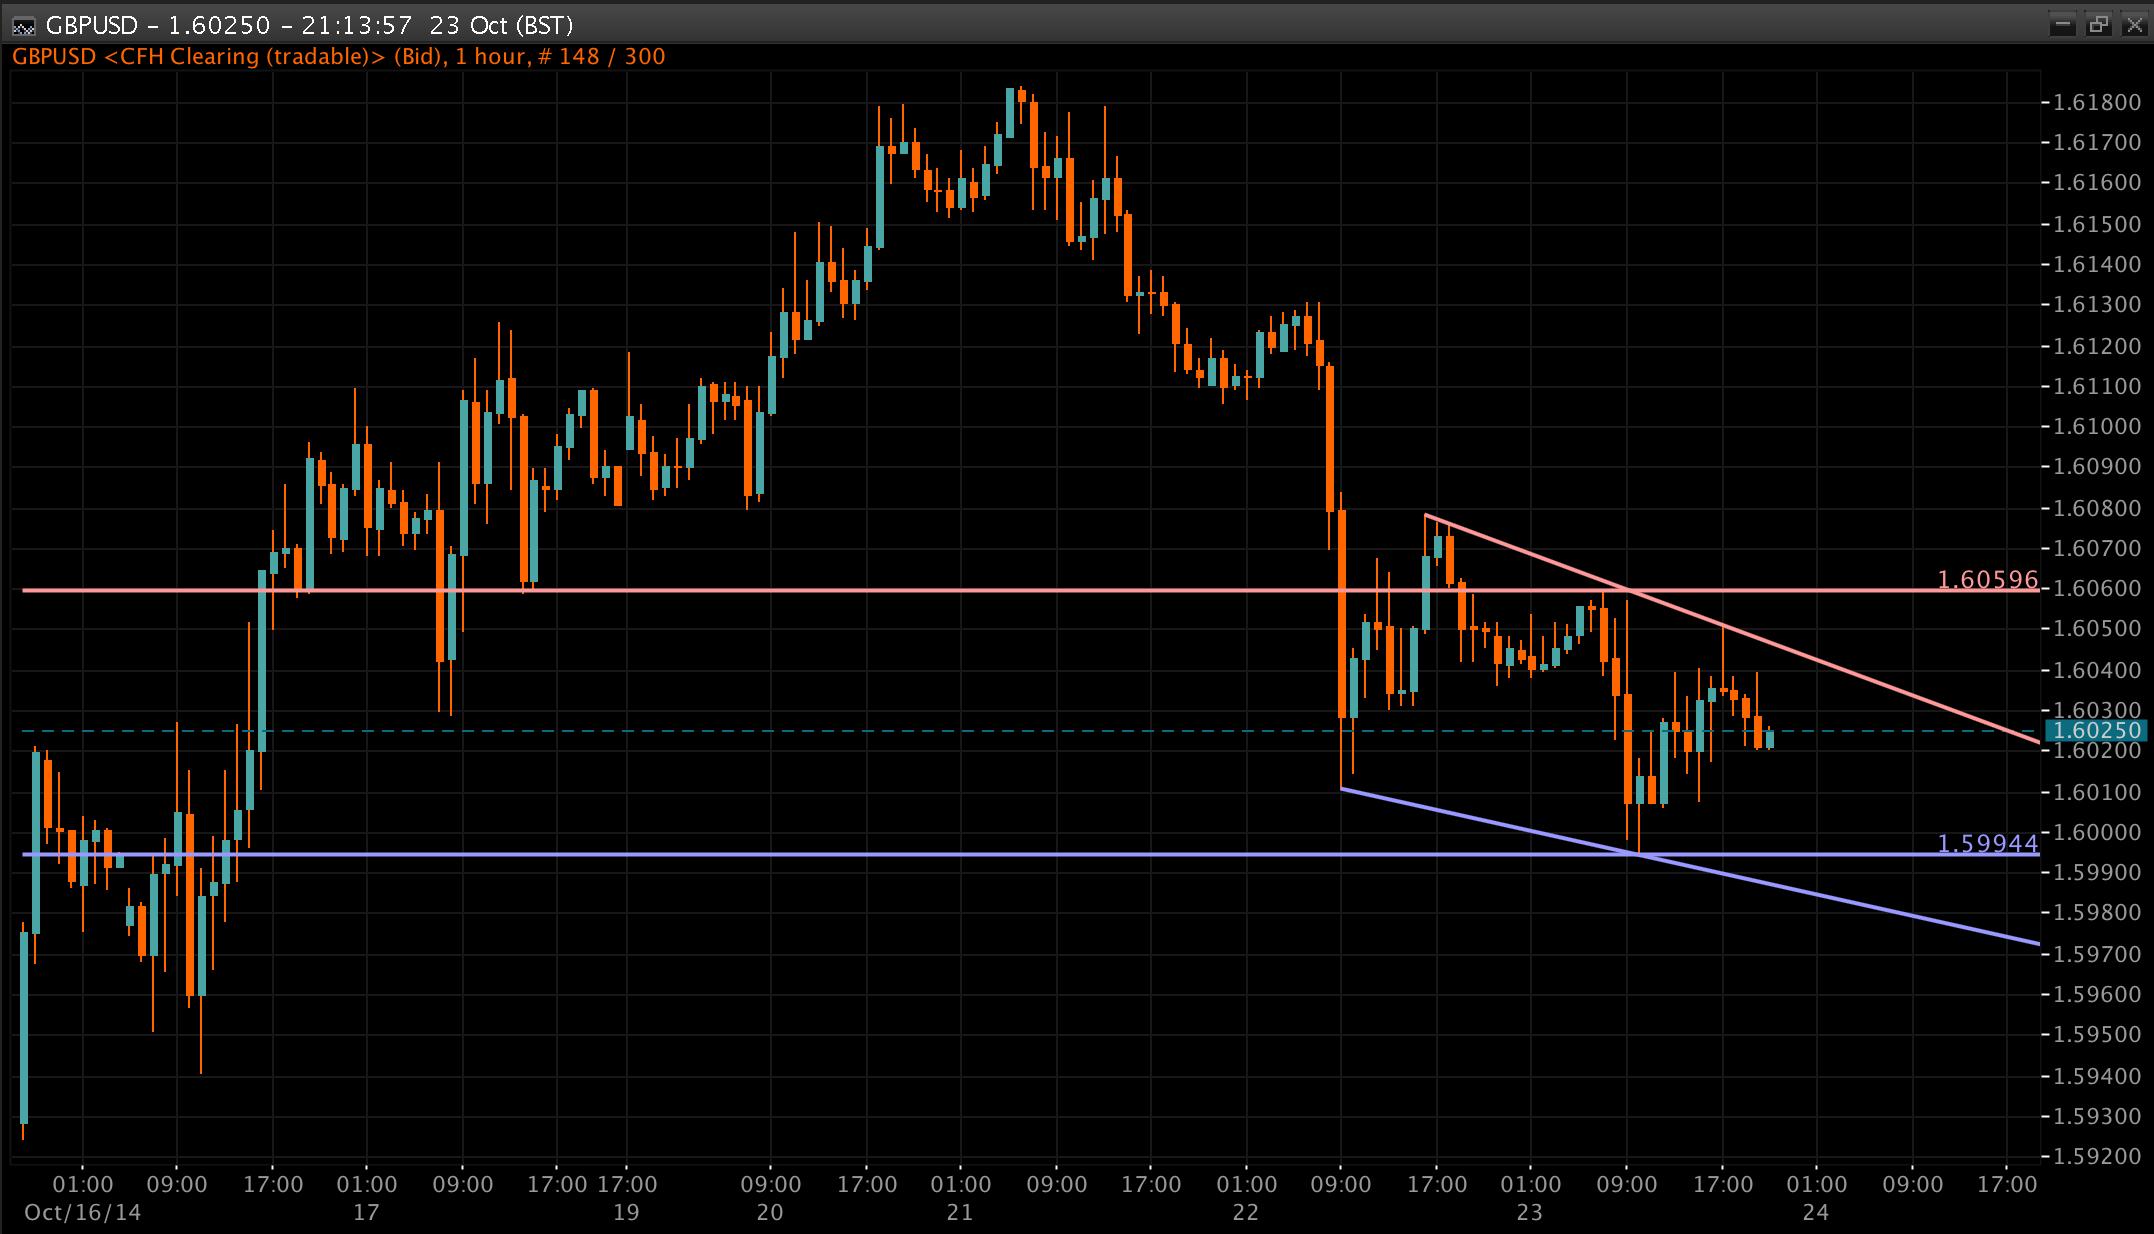 GBP/USD Chart 24 Oct 2014